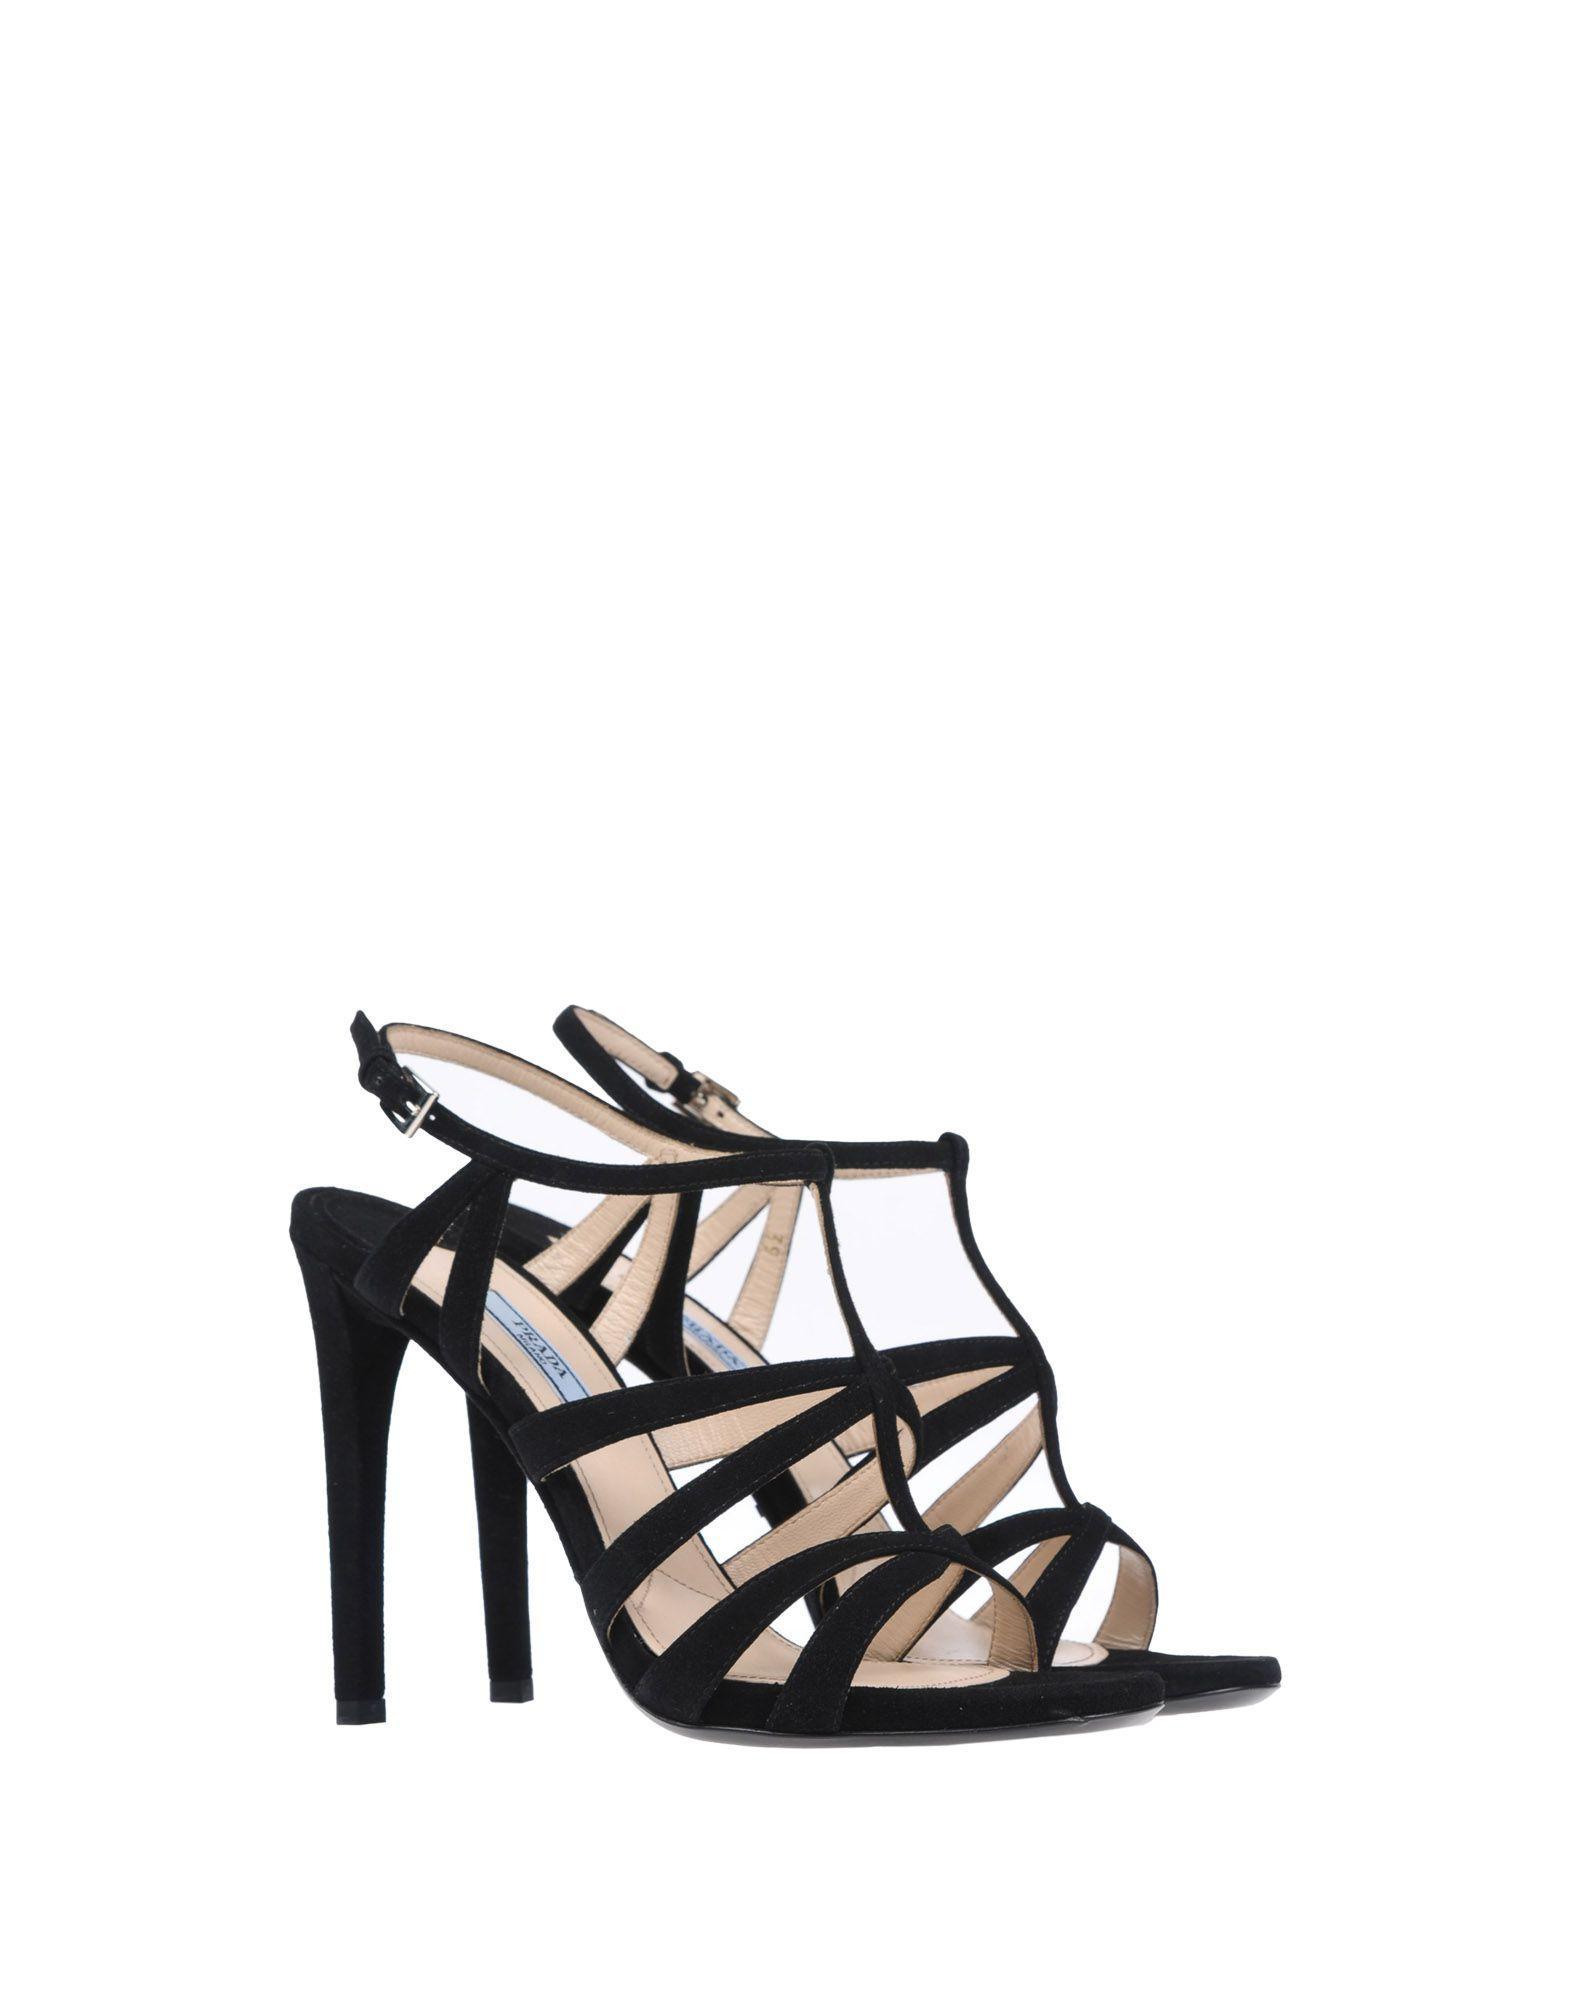 Prada Sandalen Sandalen Sandalen Damen 11211203XRGünstige gut aussehende Schuhe 6d6701